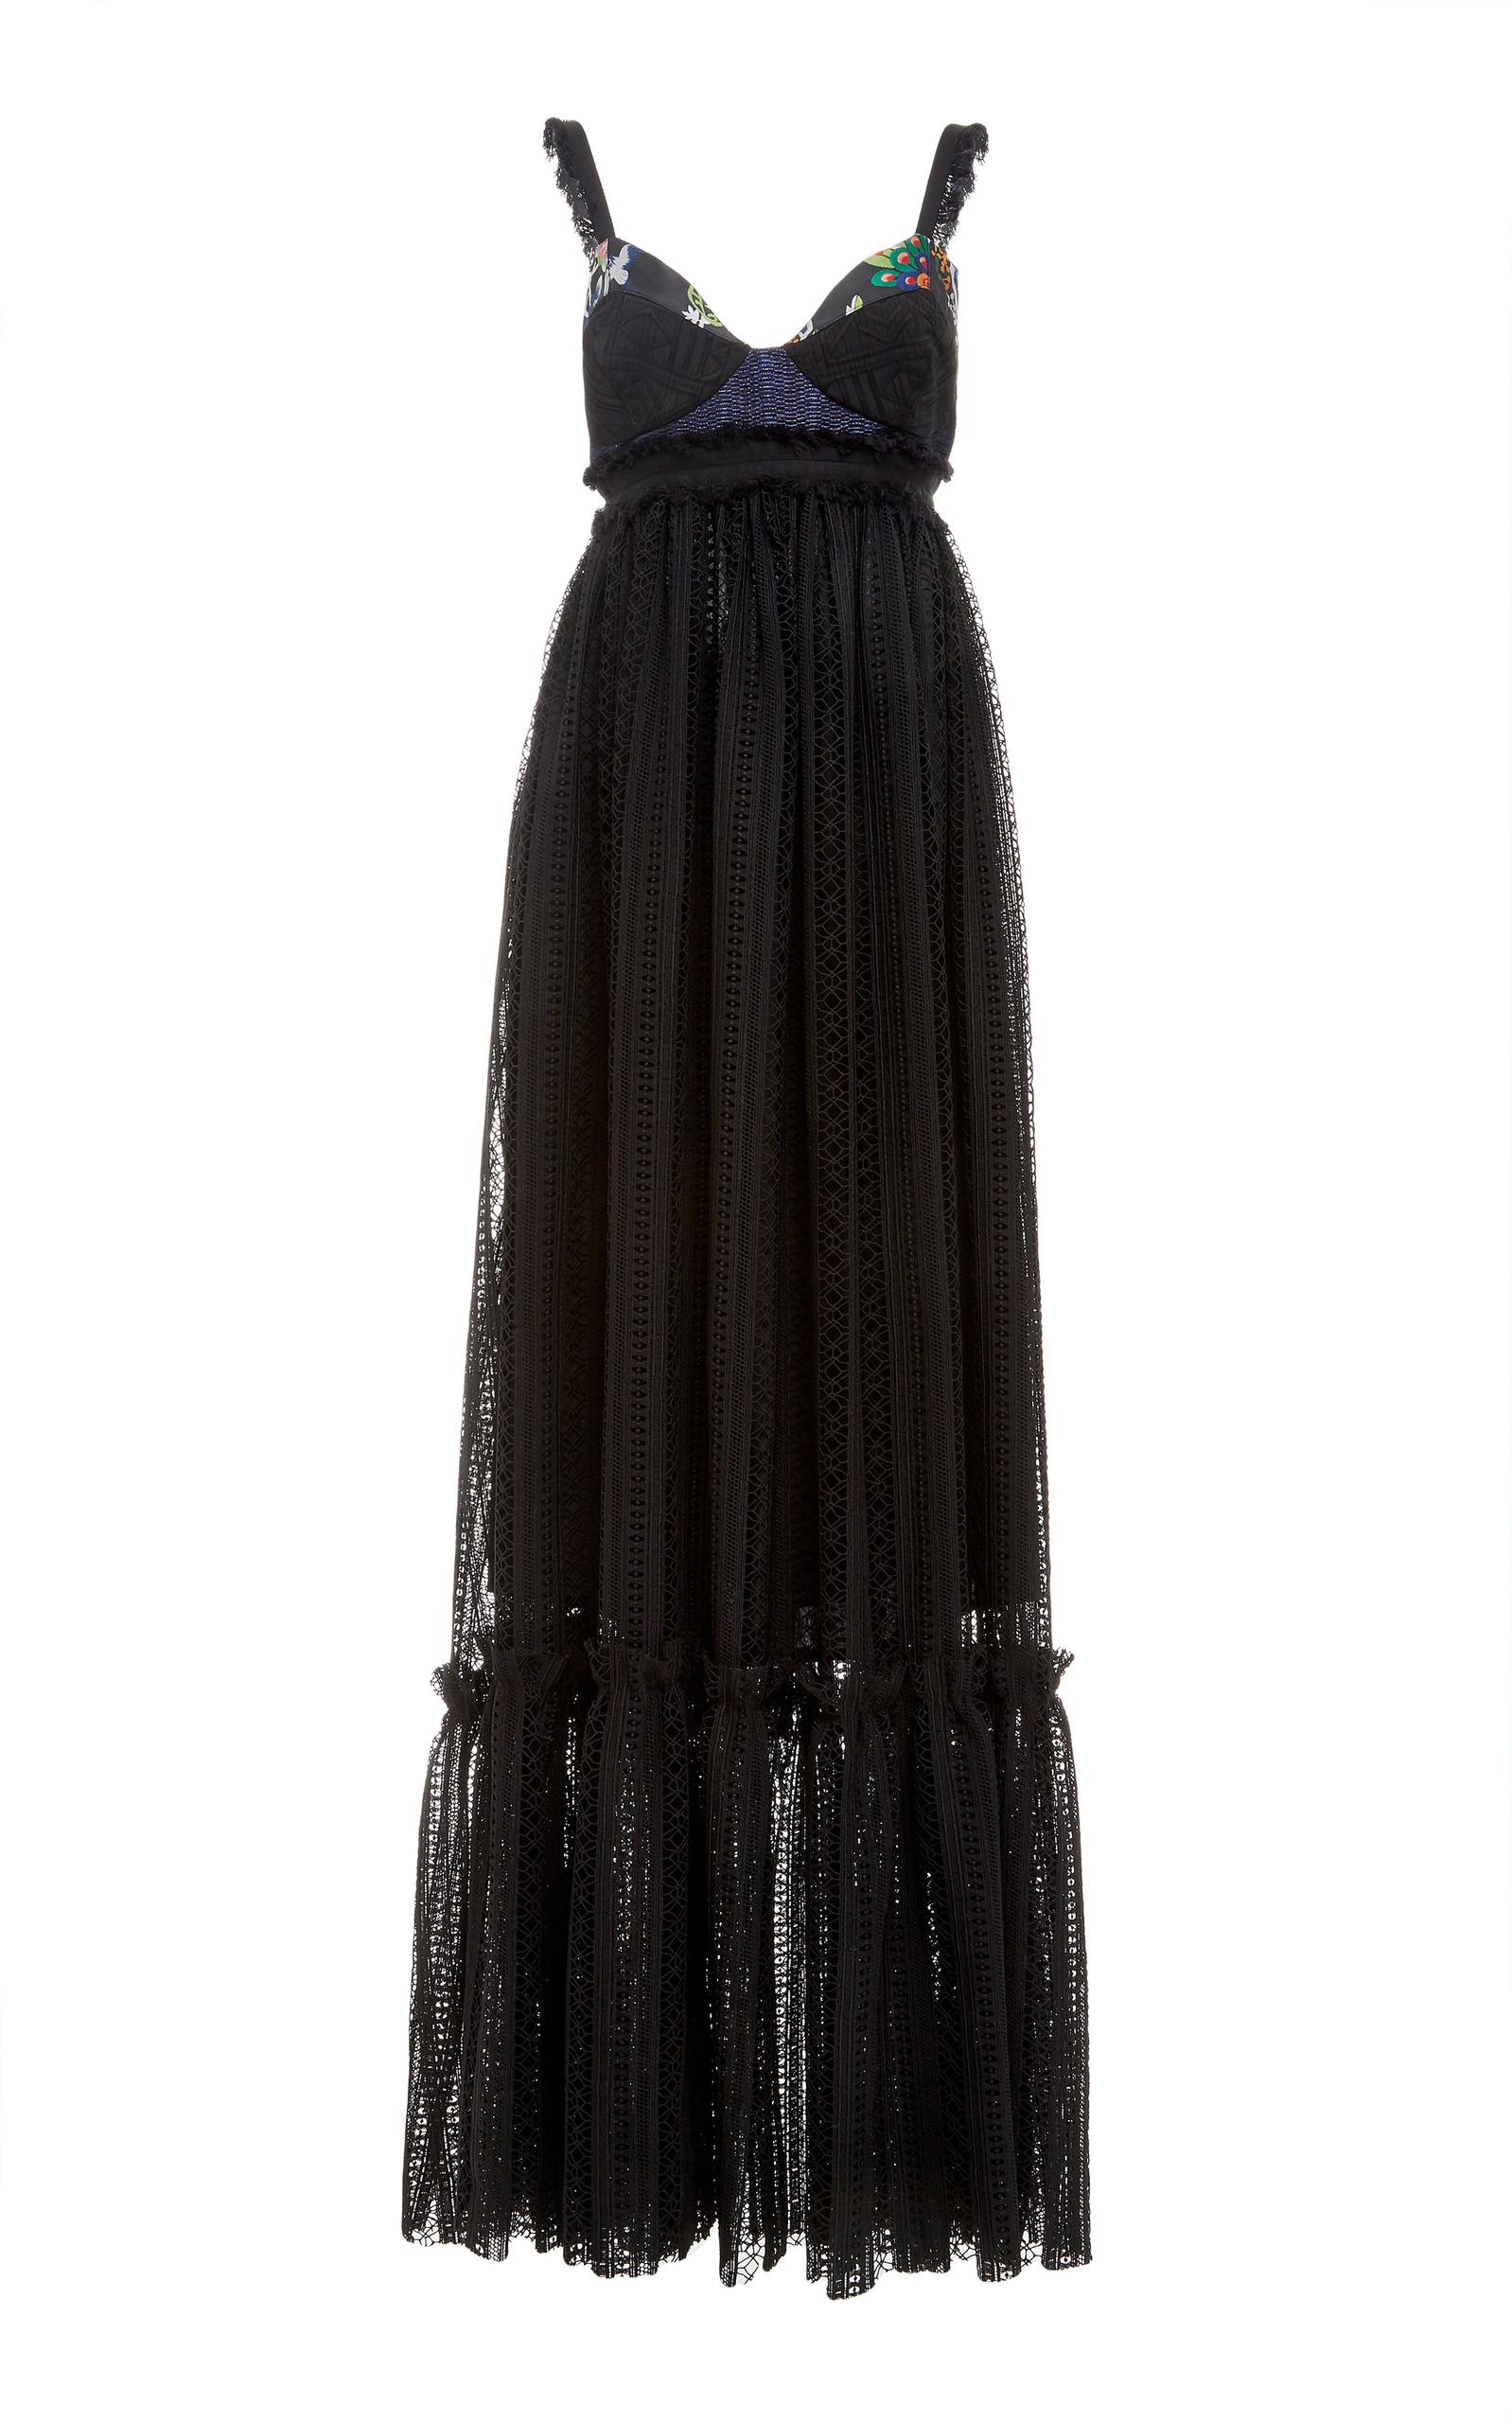 LOVE BINETTI Rebel Yell Maxi Dress in Black